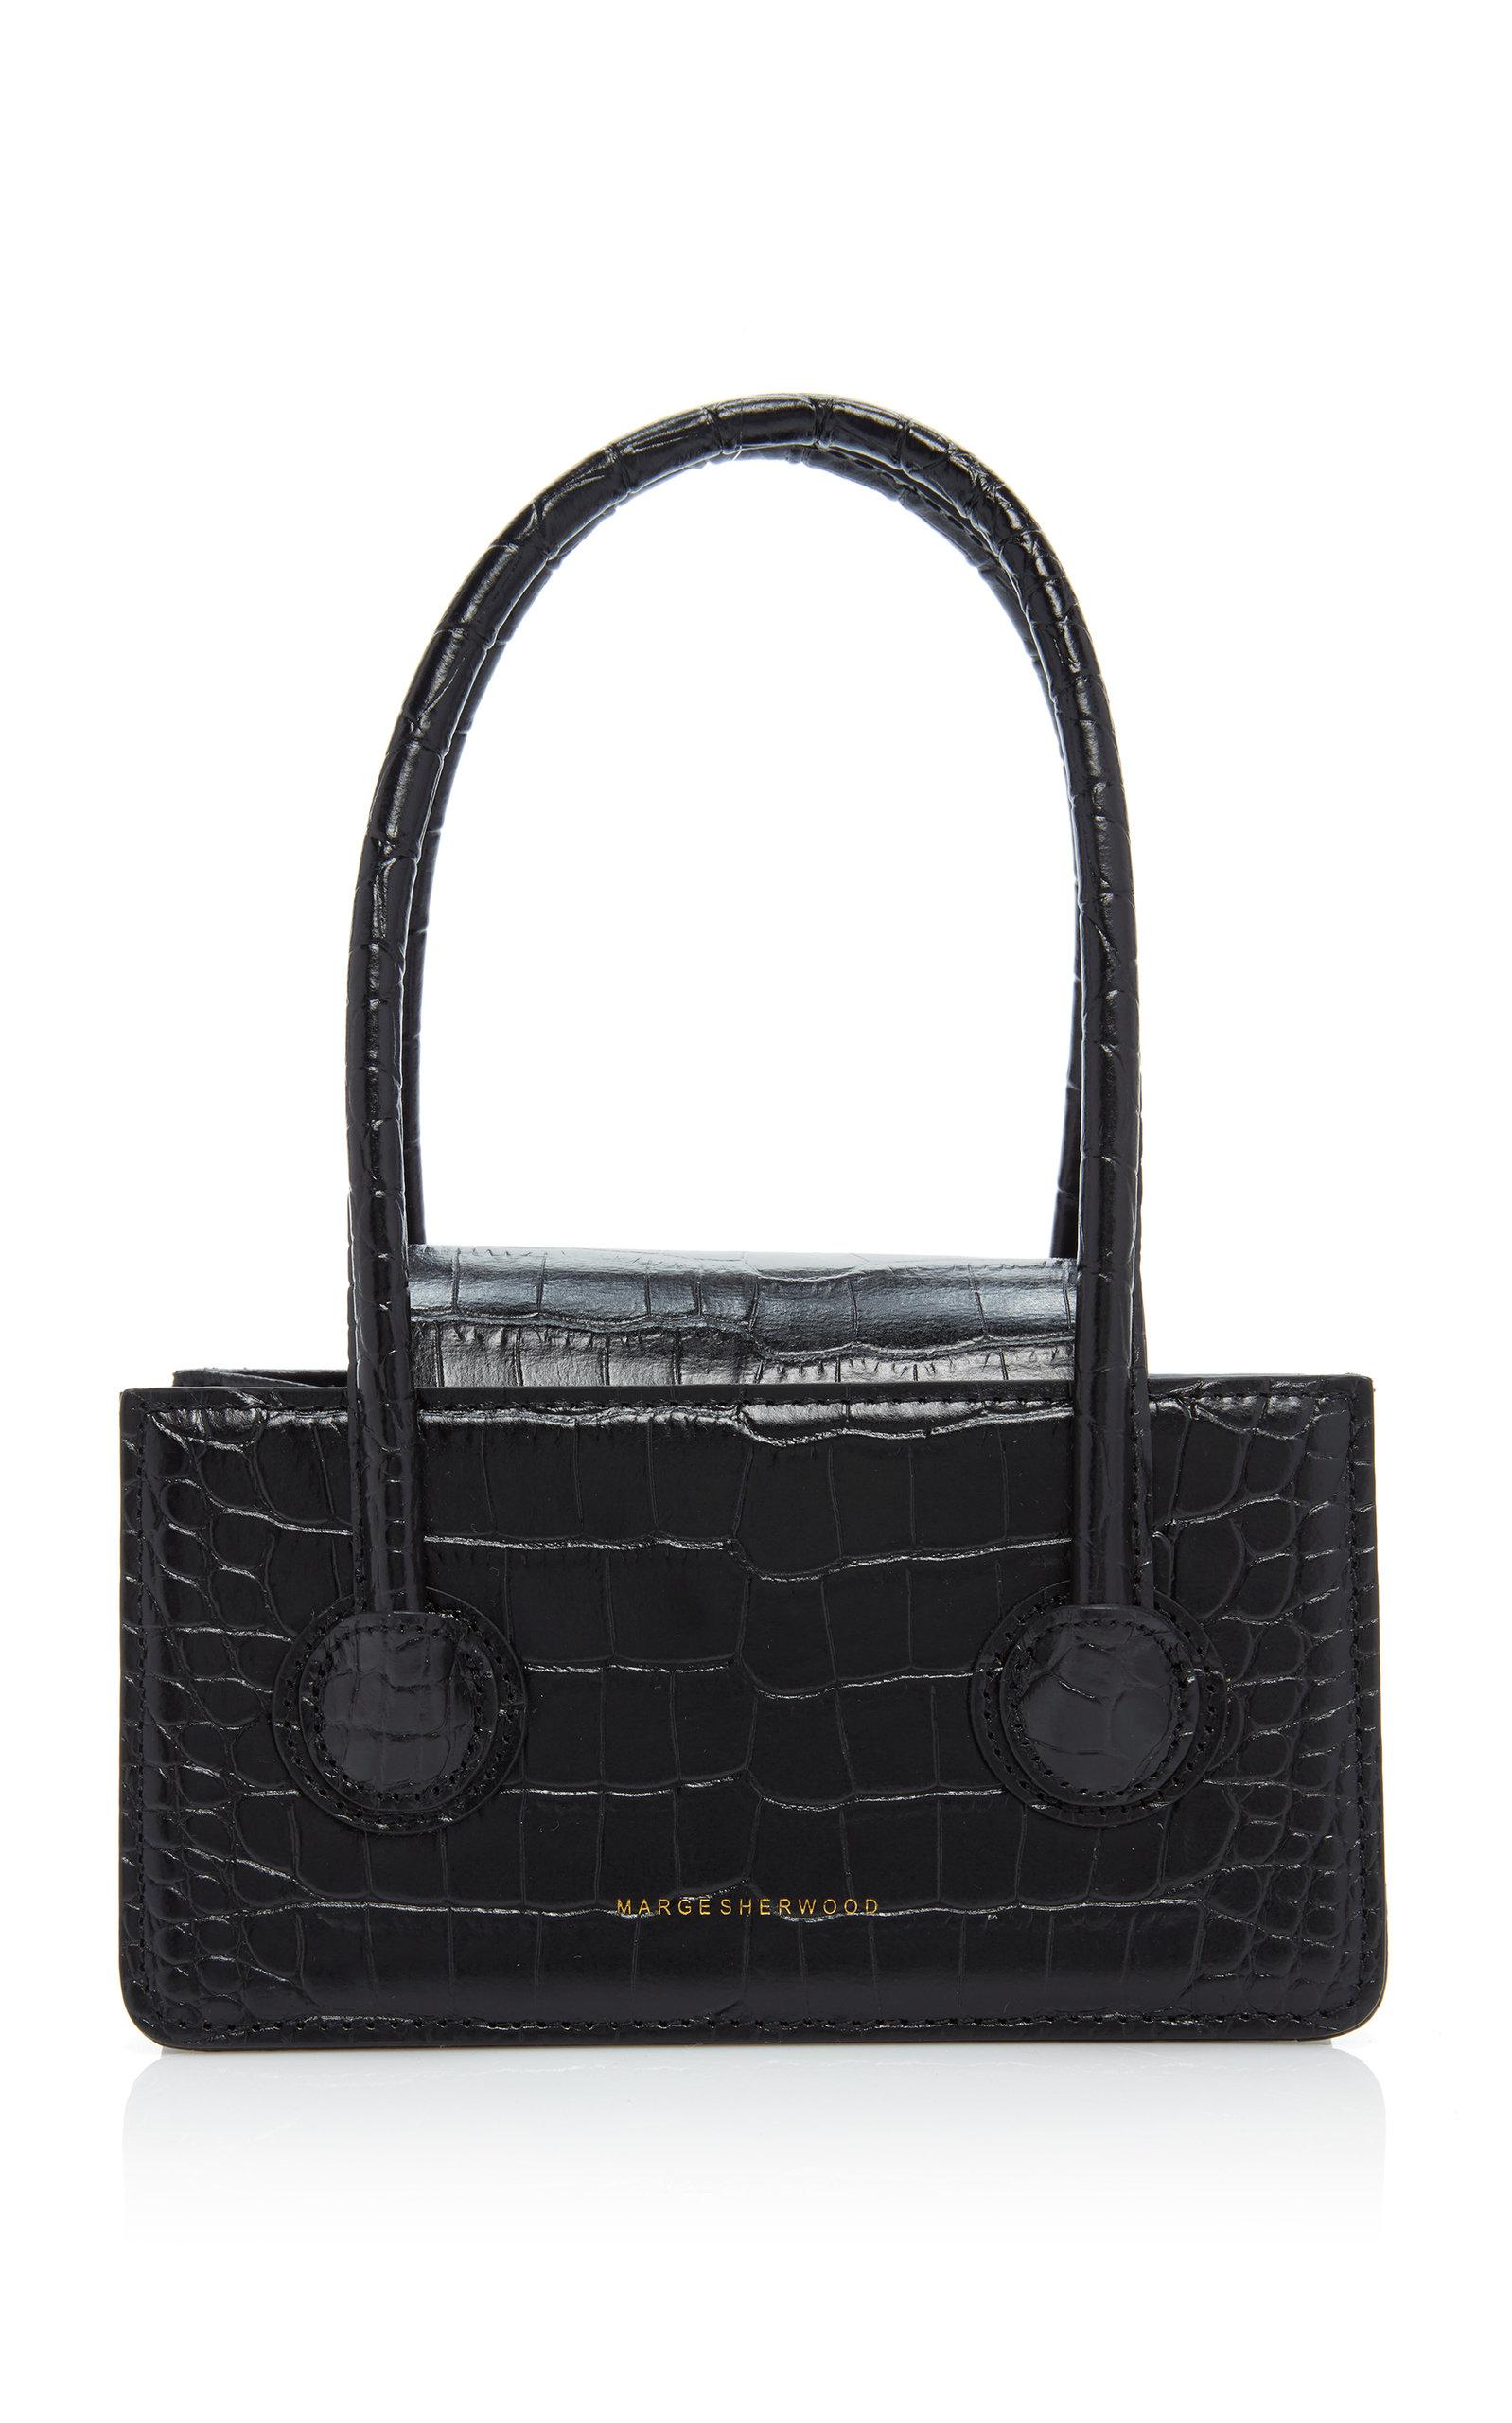 Marge Sherwood Grandma Mini Croc-effect Leather Top Handle Bag In Black